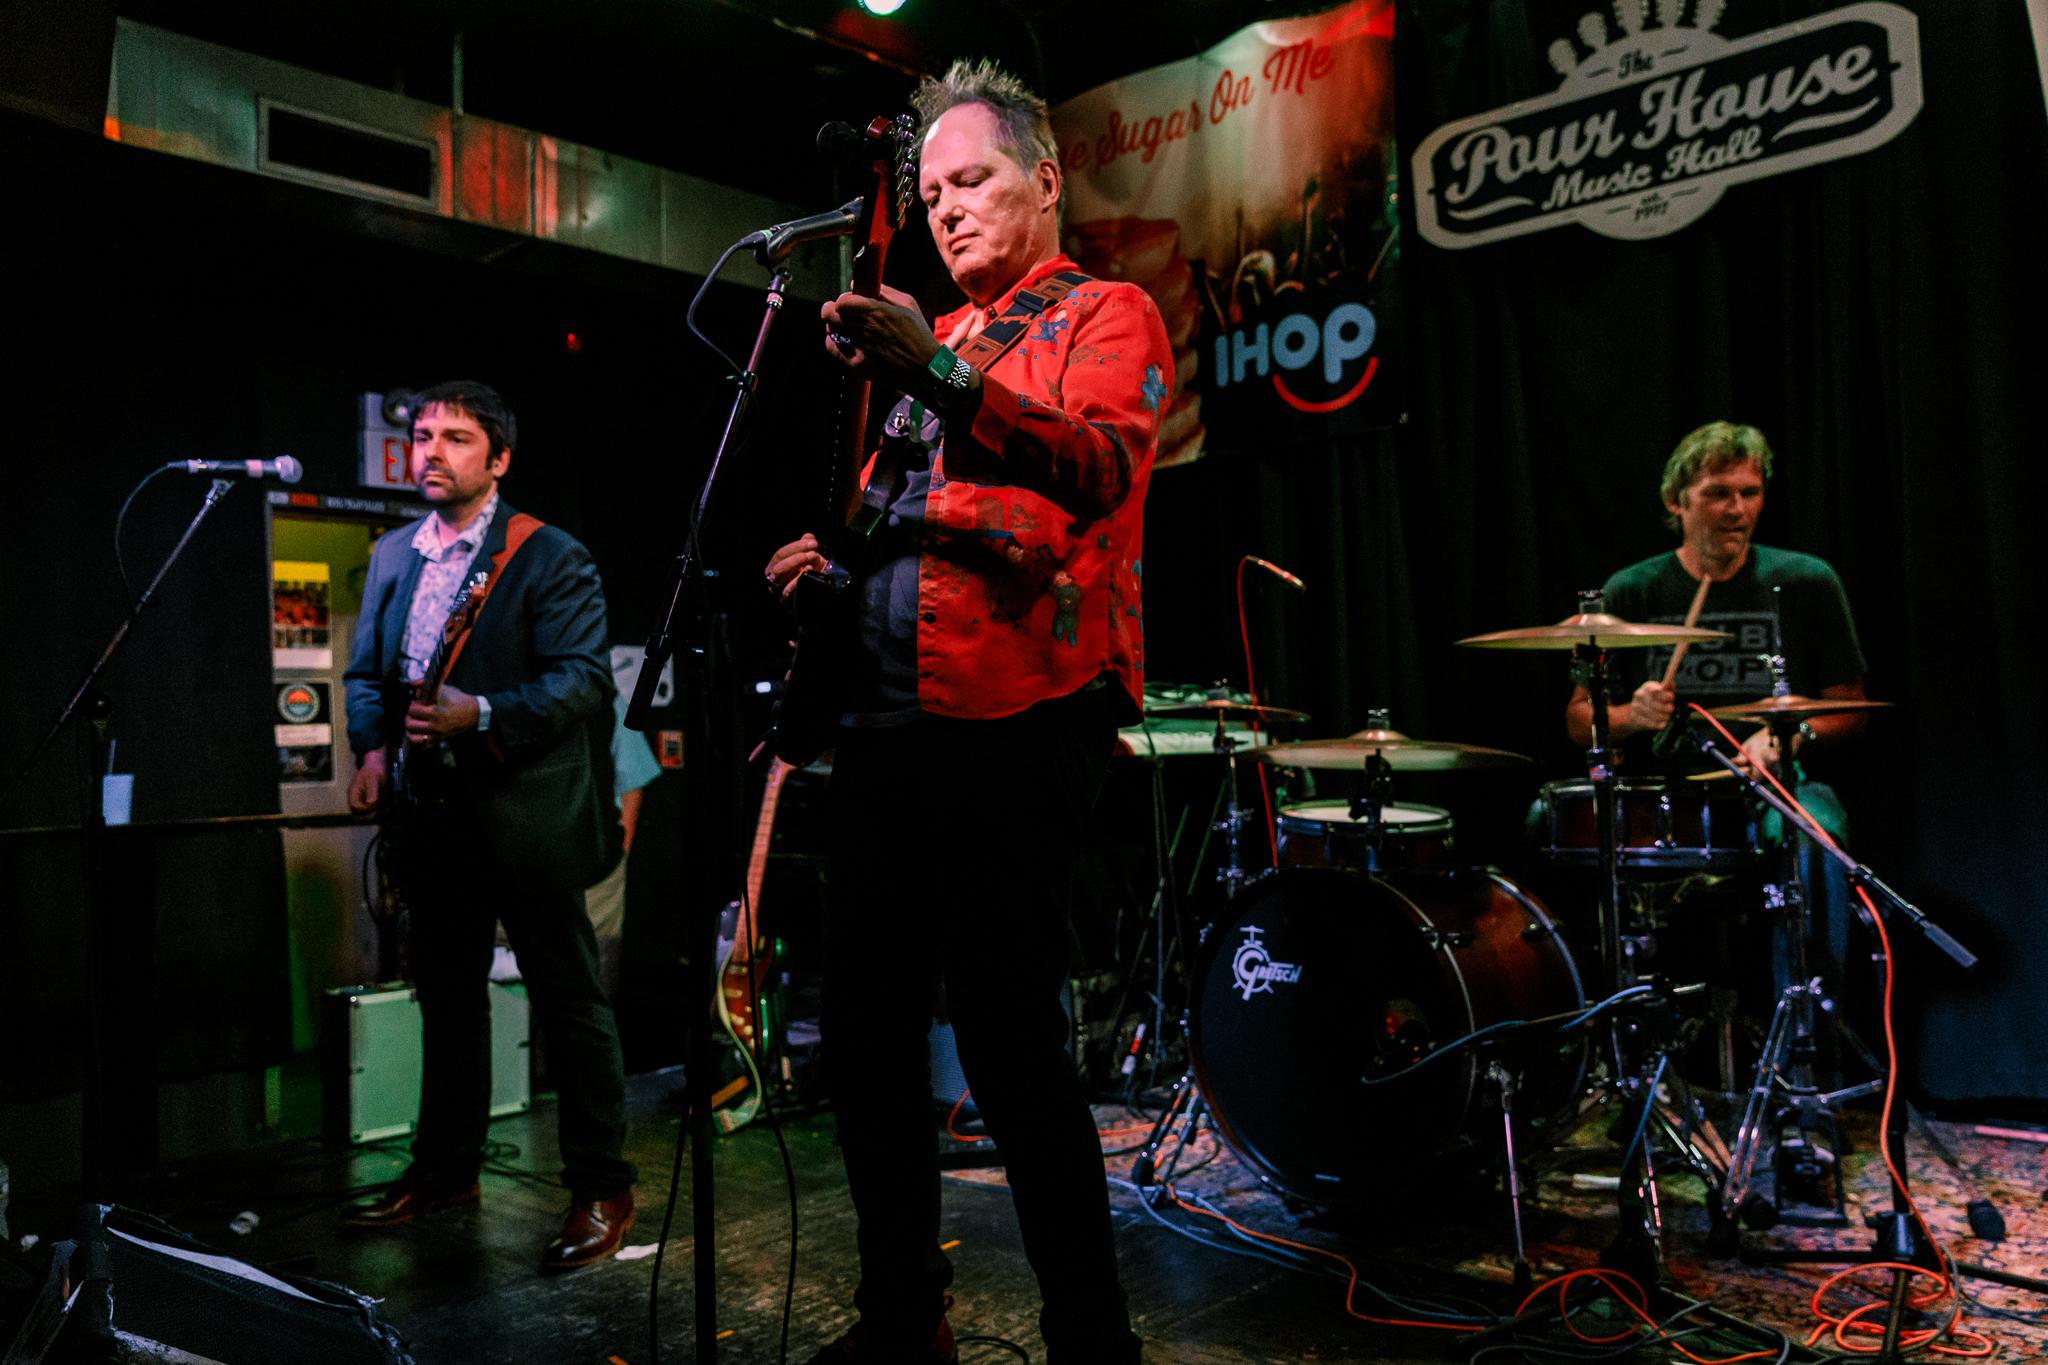 Richard Lloyd performing at Hopscotch Music Festival 2017 in Raleigh, NC - 9/9/2017 (photo by Matt Condon / @arcane93)